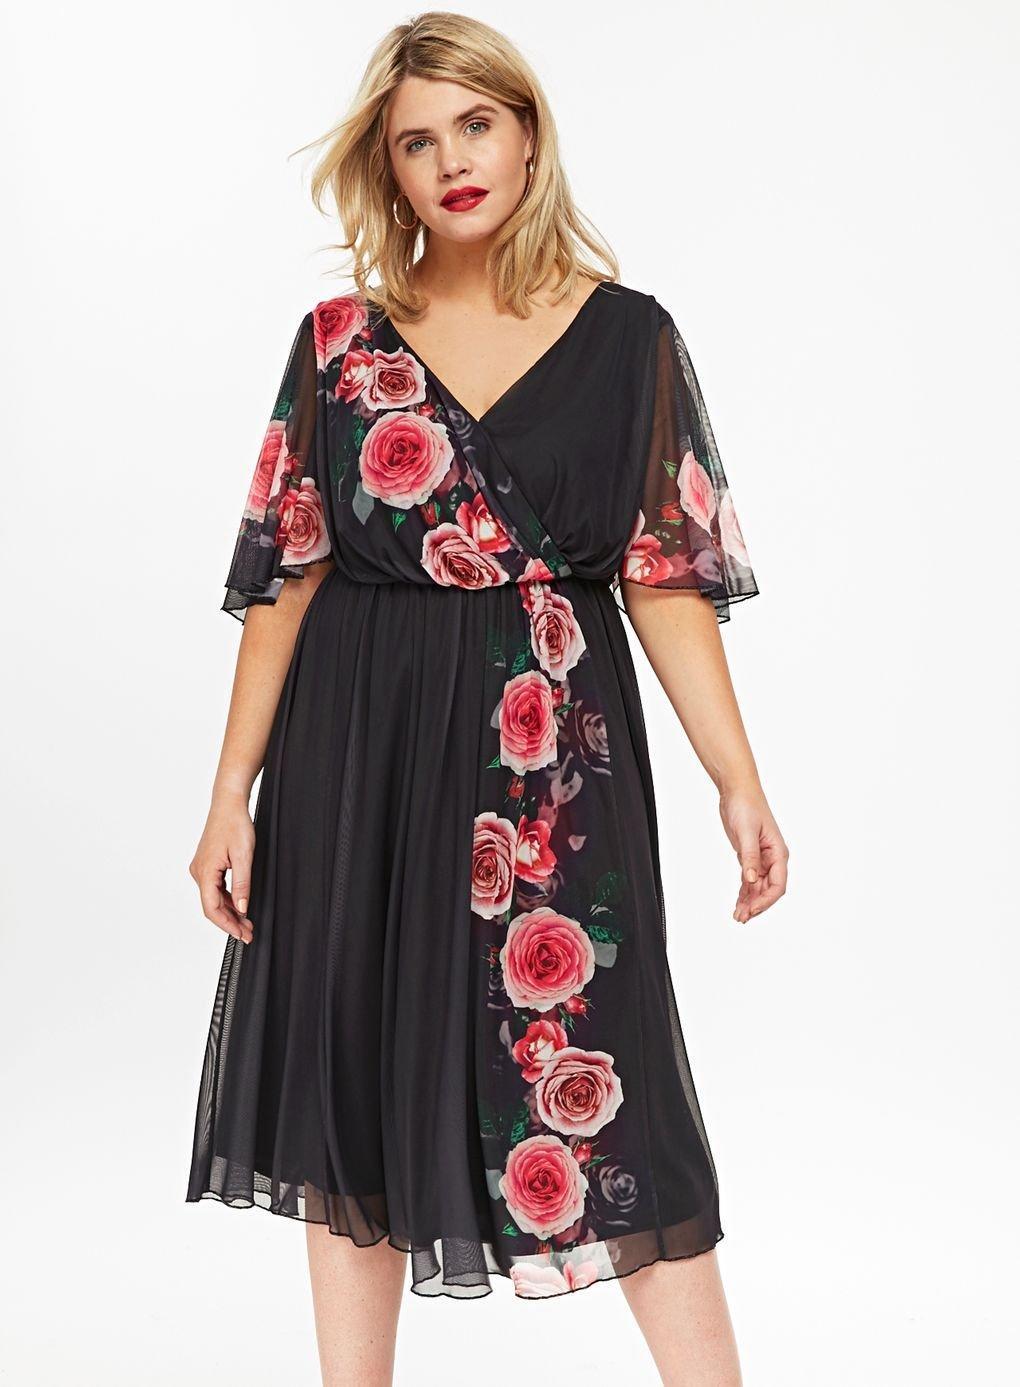 06cbb75543 ... Black Floral Print Skater Dress - Lyst. Visit Evans. Tap to visit site